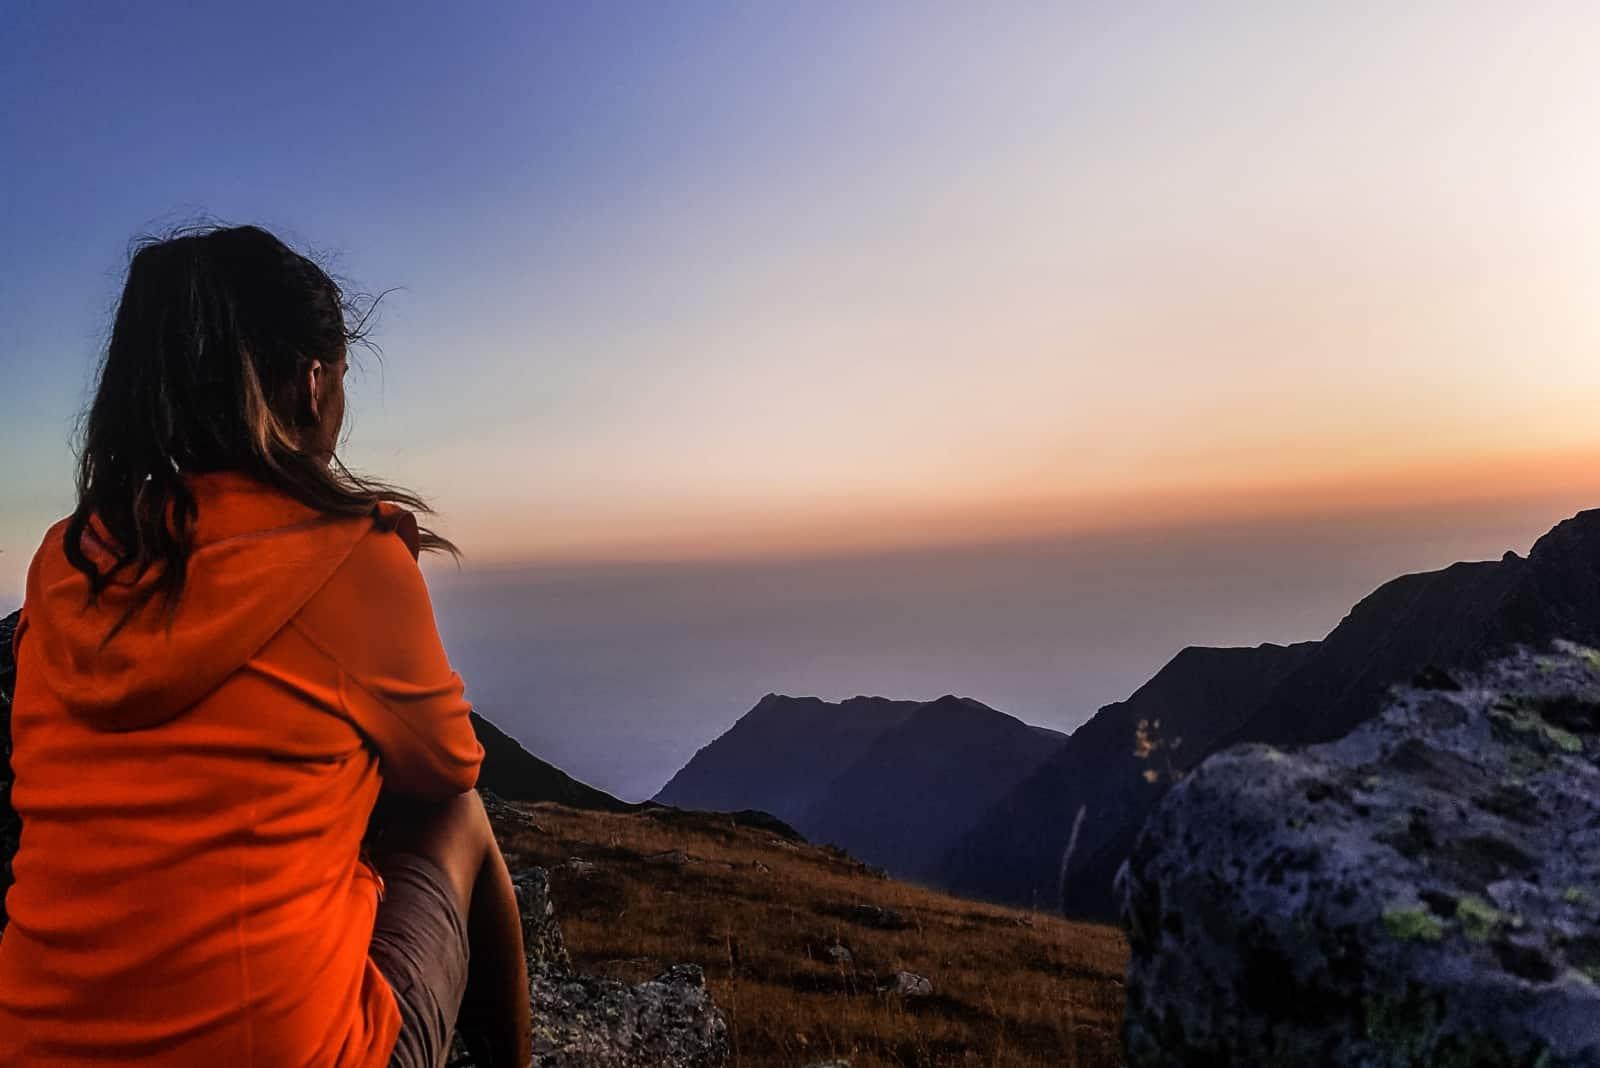 woman in orange jacket sitting on rock looking at mountain